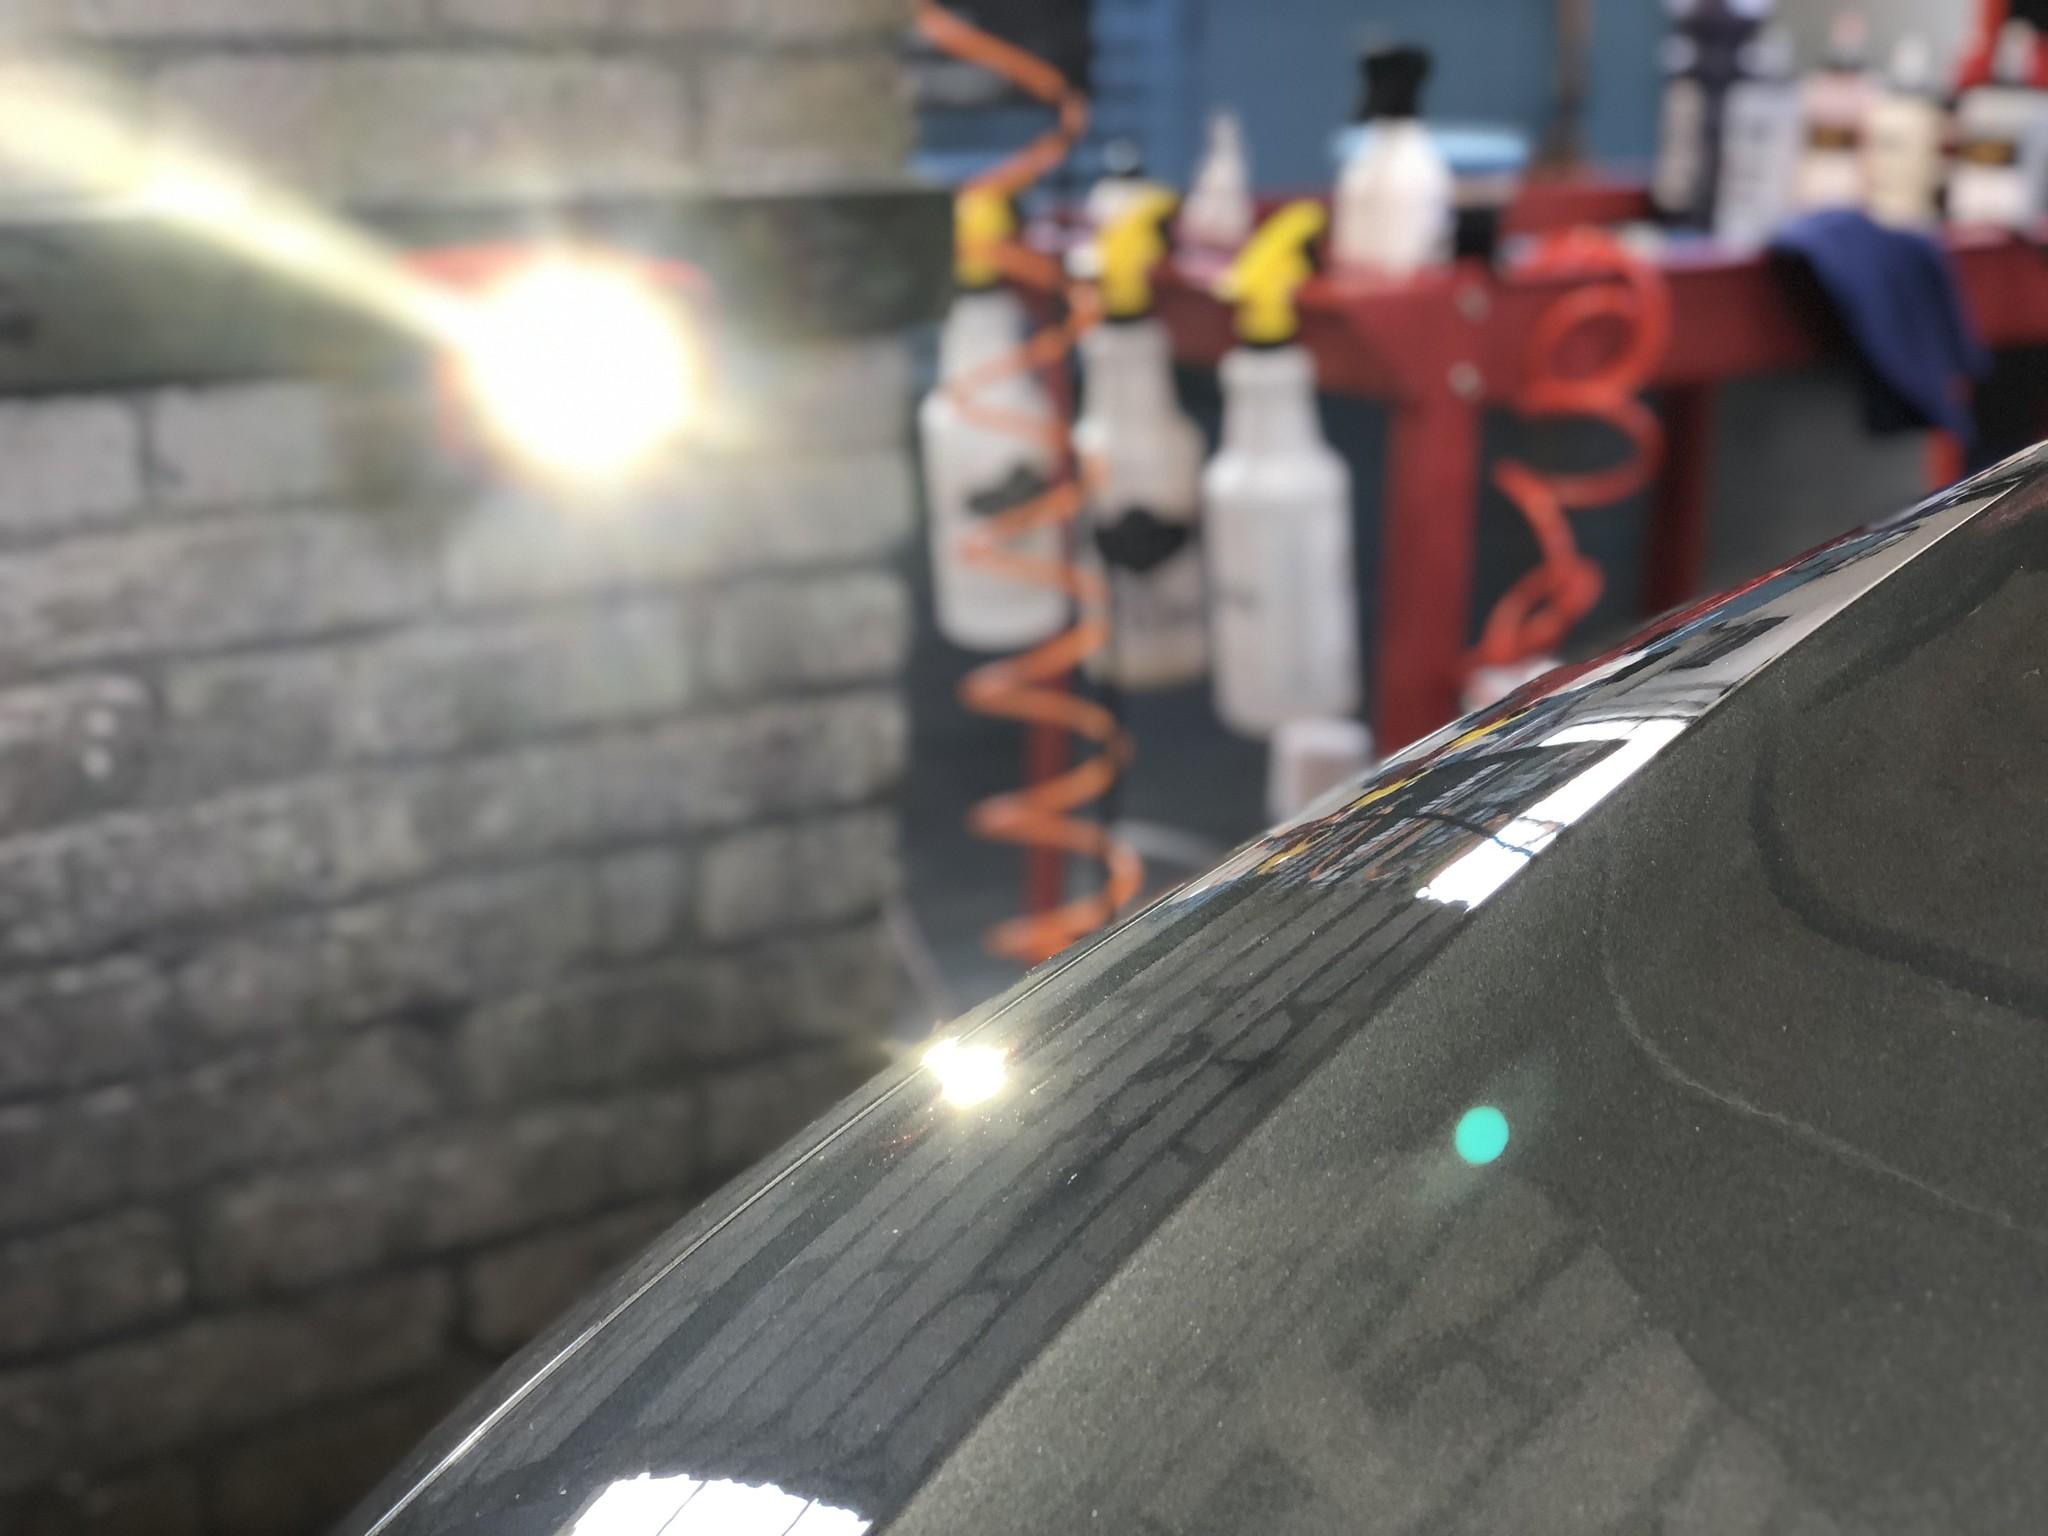 NORDRIDE NORDRIDE 2044 COB LED SLIM POWER 10W